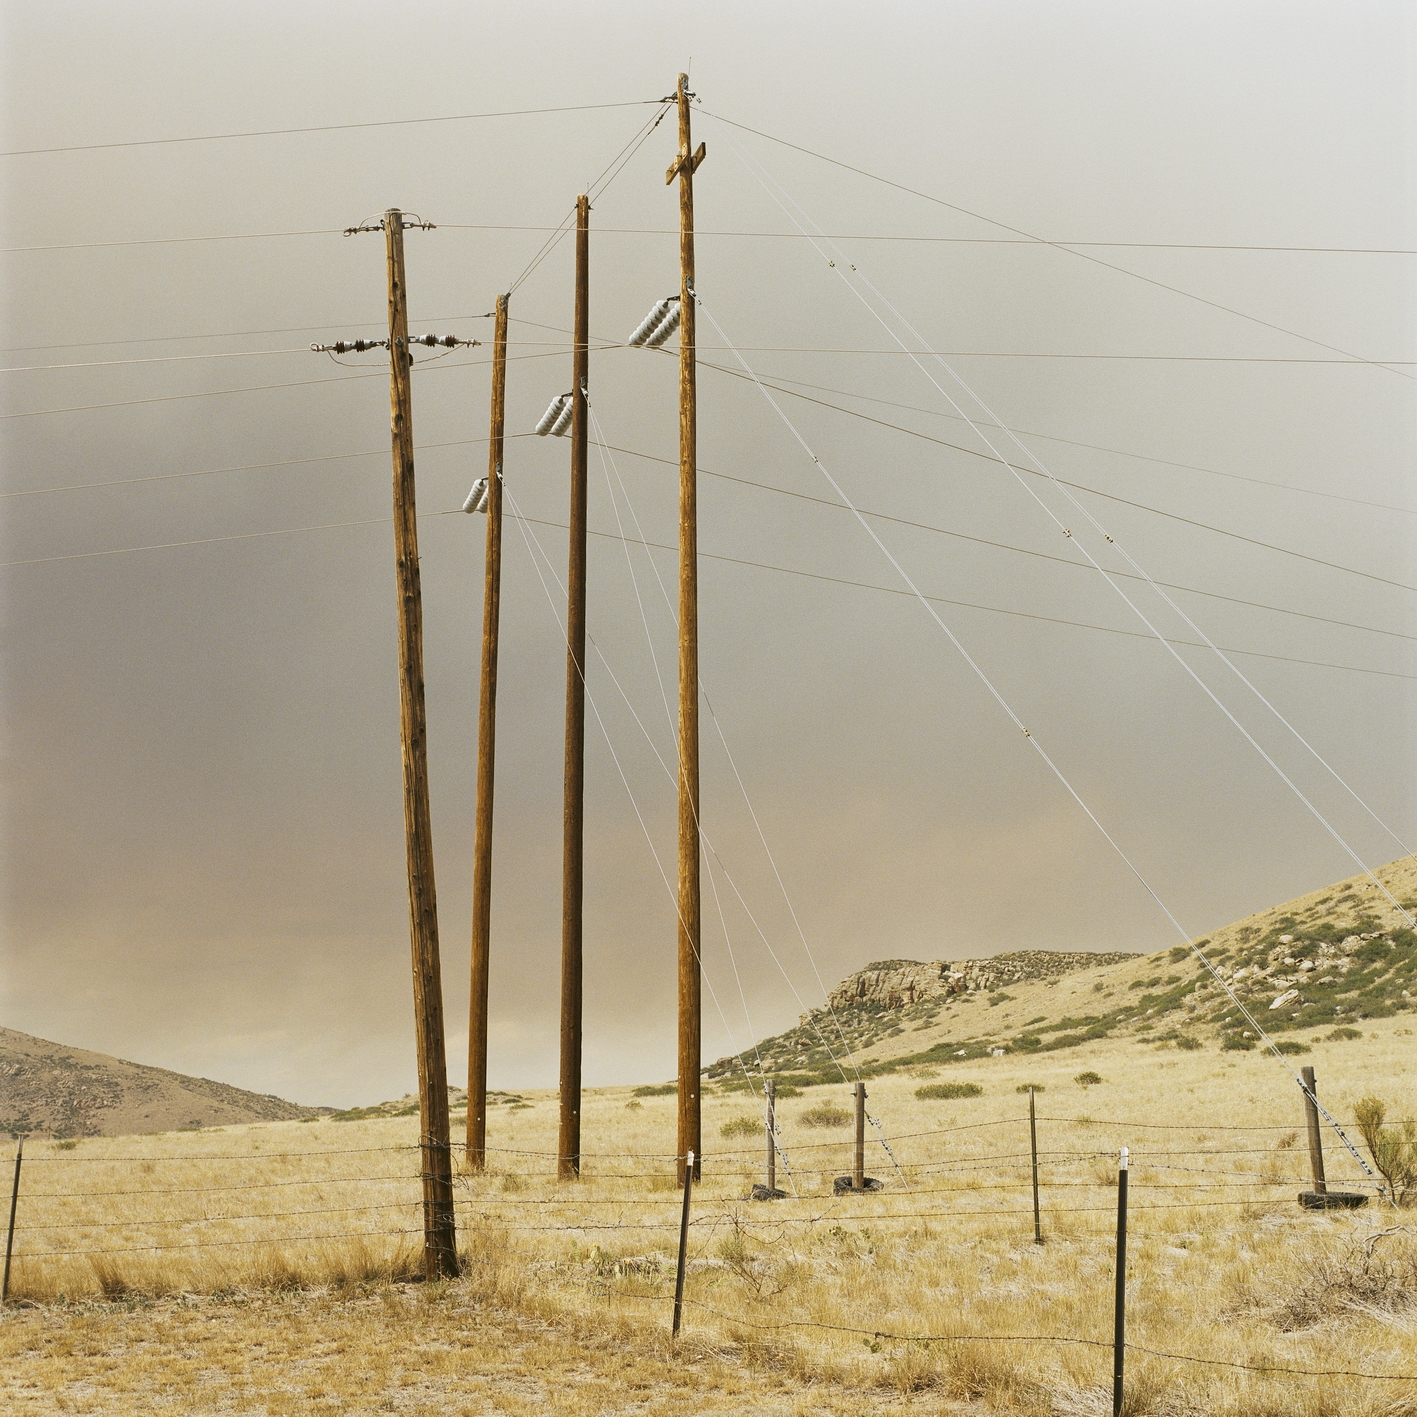 03_Larimer County - Colorado 2012®RonanGuillou